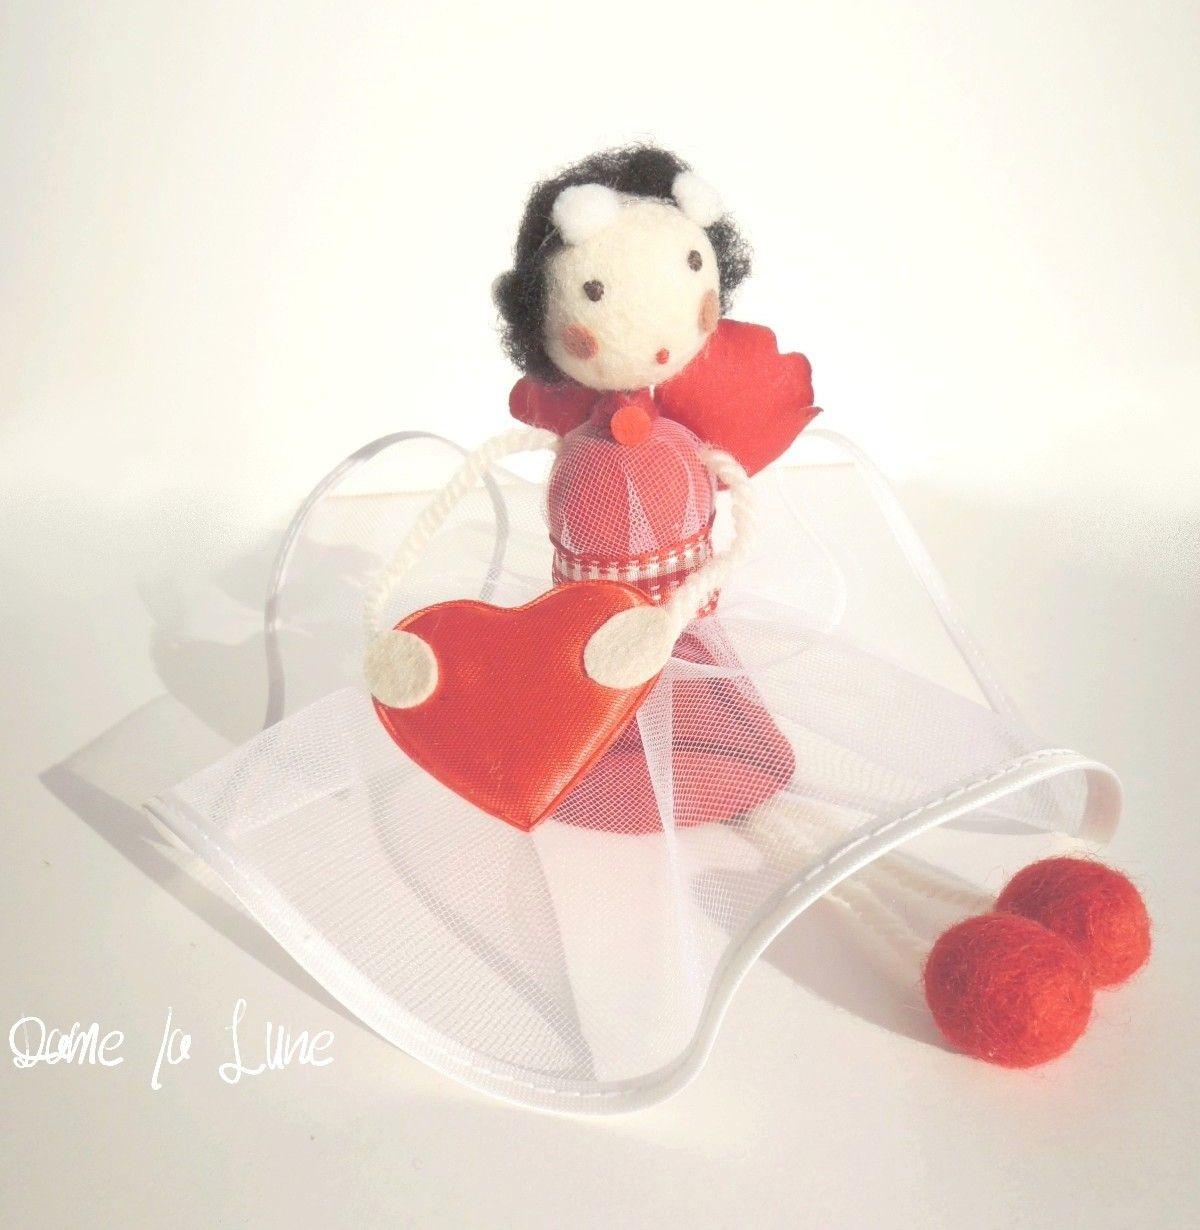 - MOBILE Elfe en suspension et son coeur rouge